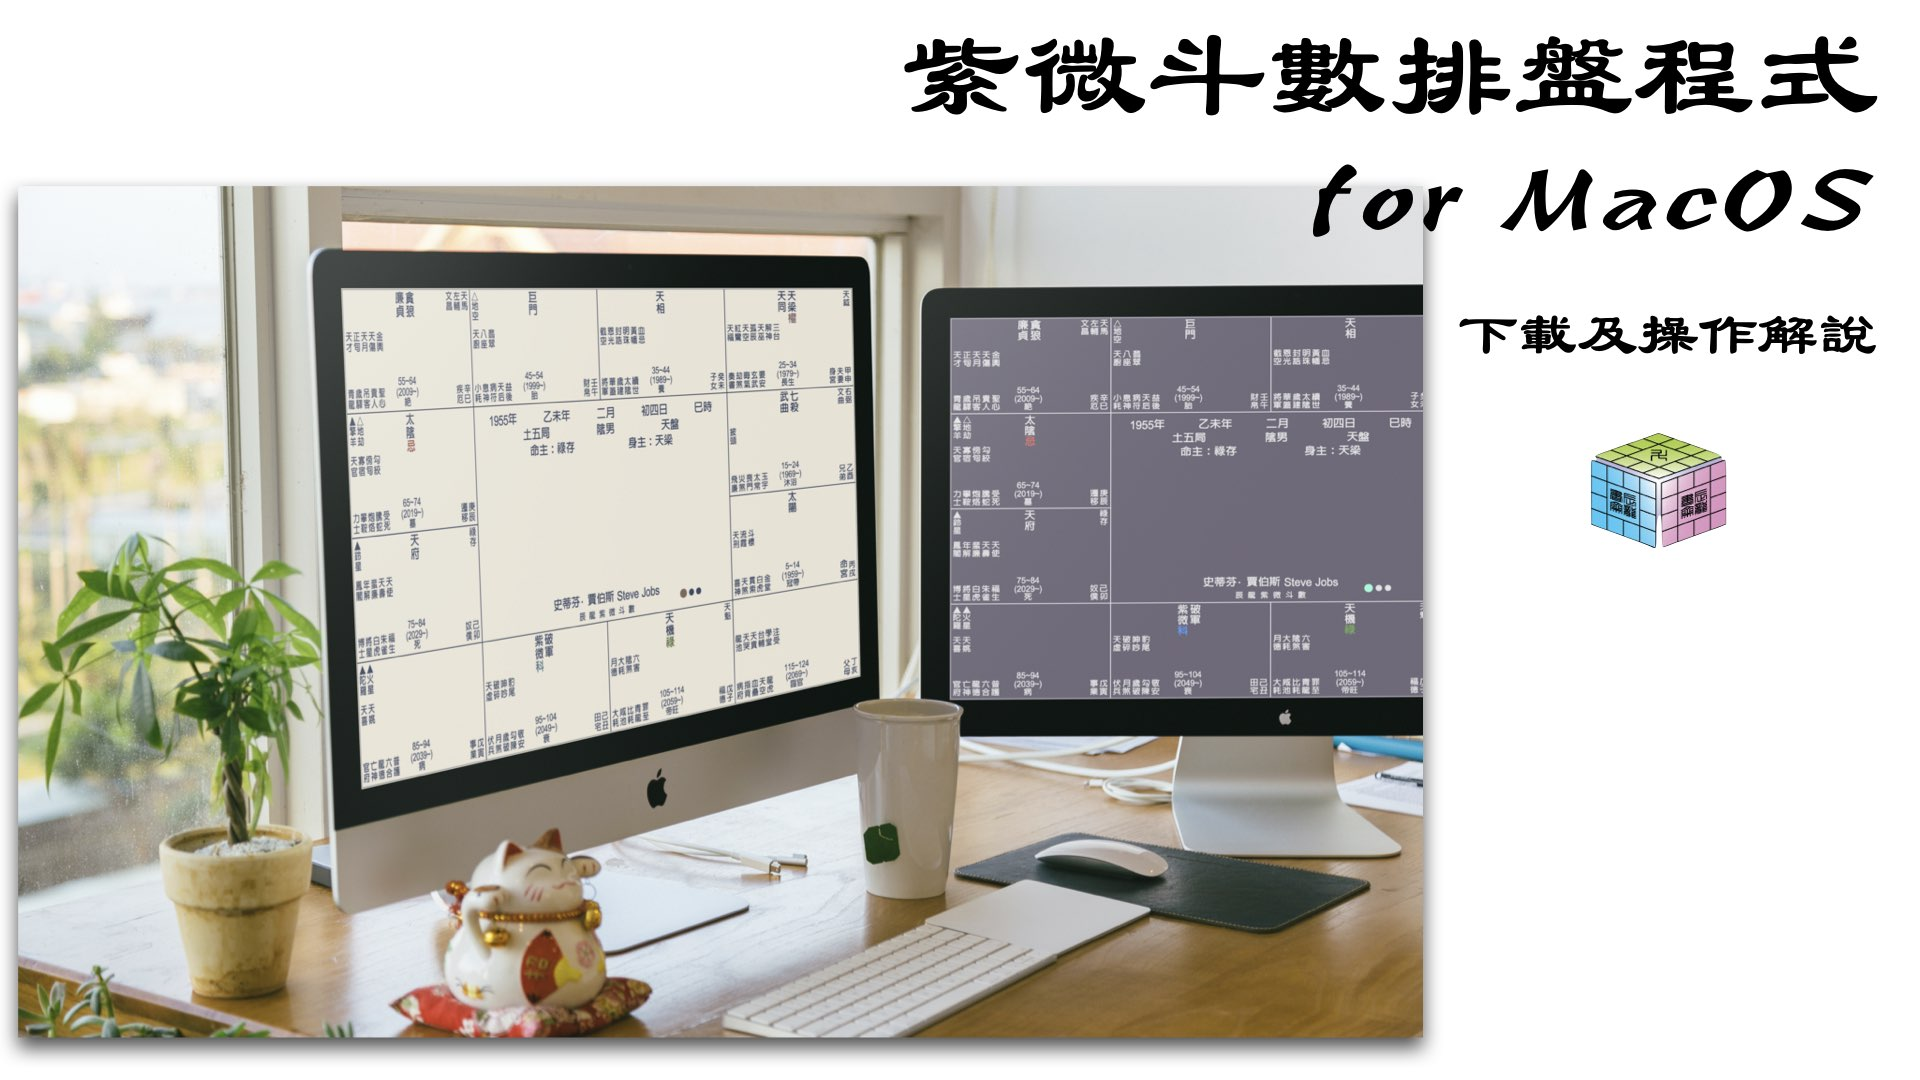 紫微斗數排盤程式下載及解說 for MacOS